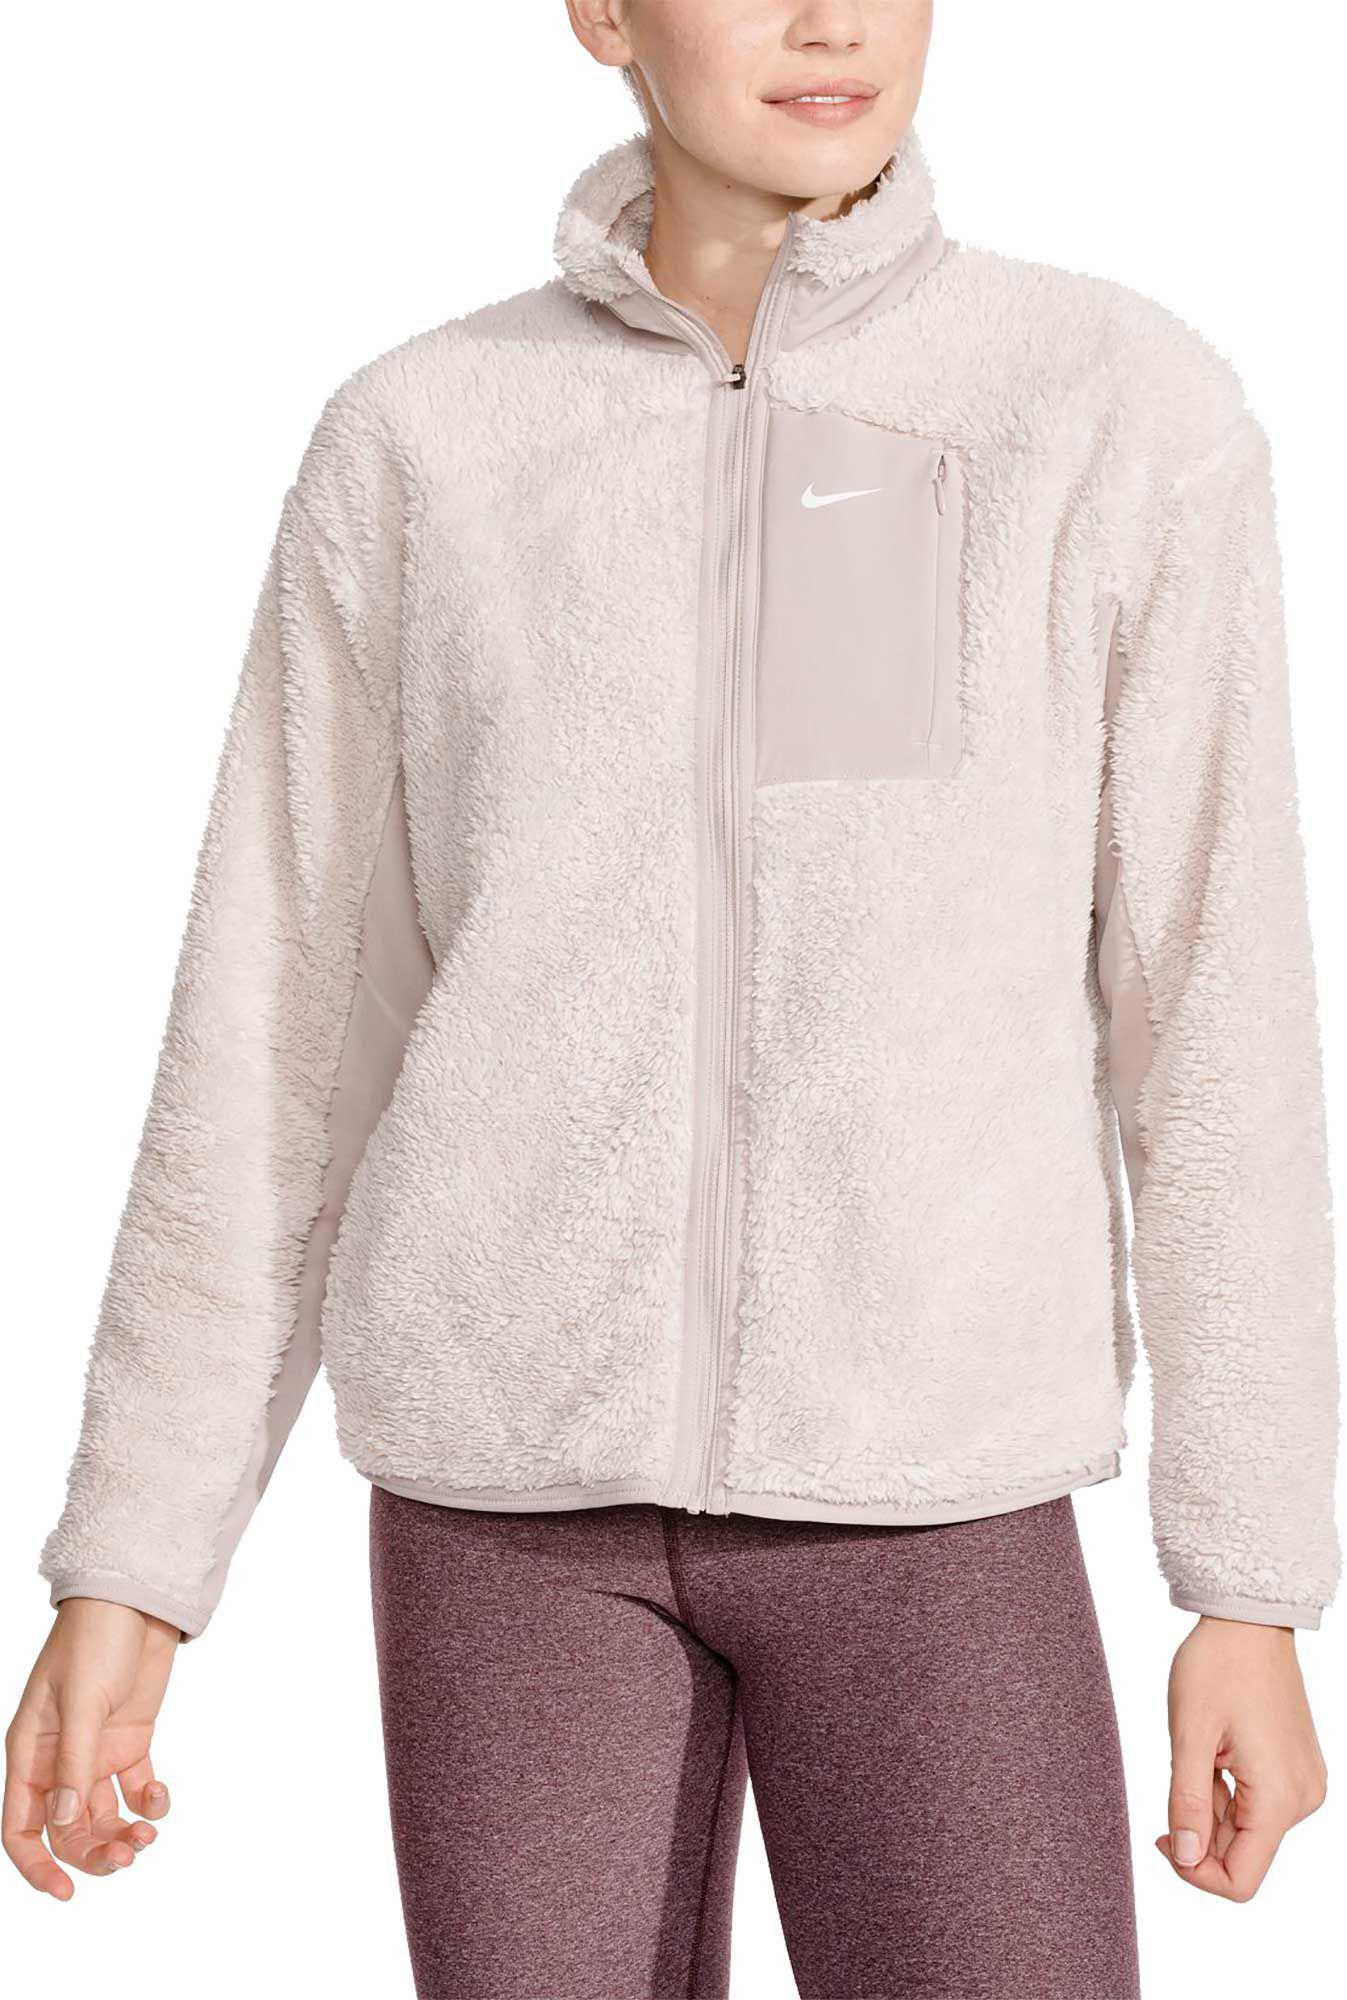 c14ea82711c5 Lyst - Nike Therma Sherpa Full Zip Jacket in Natural